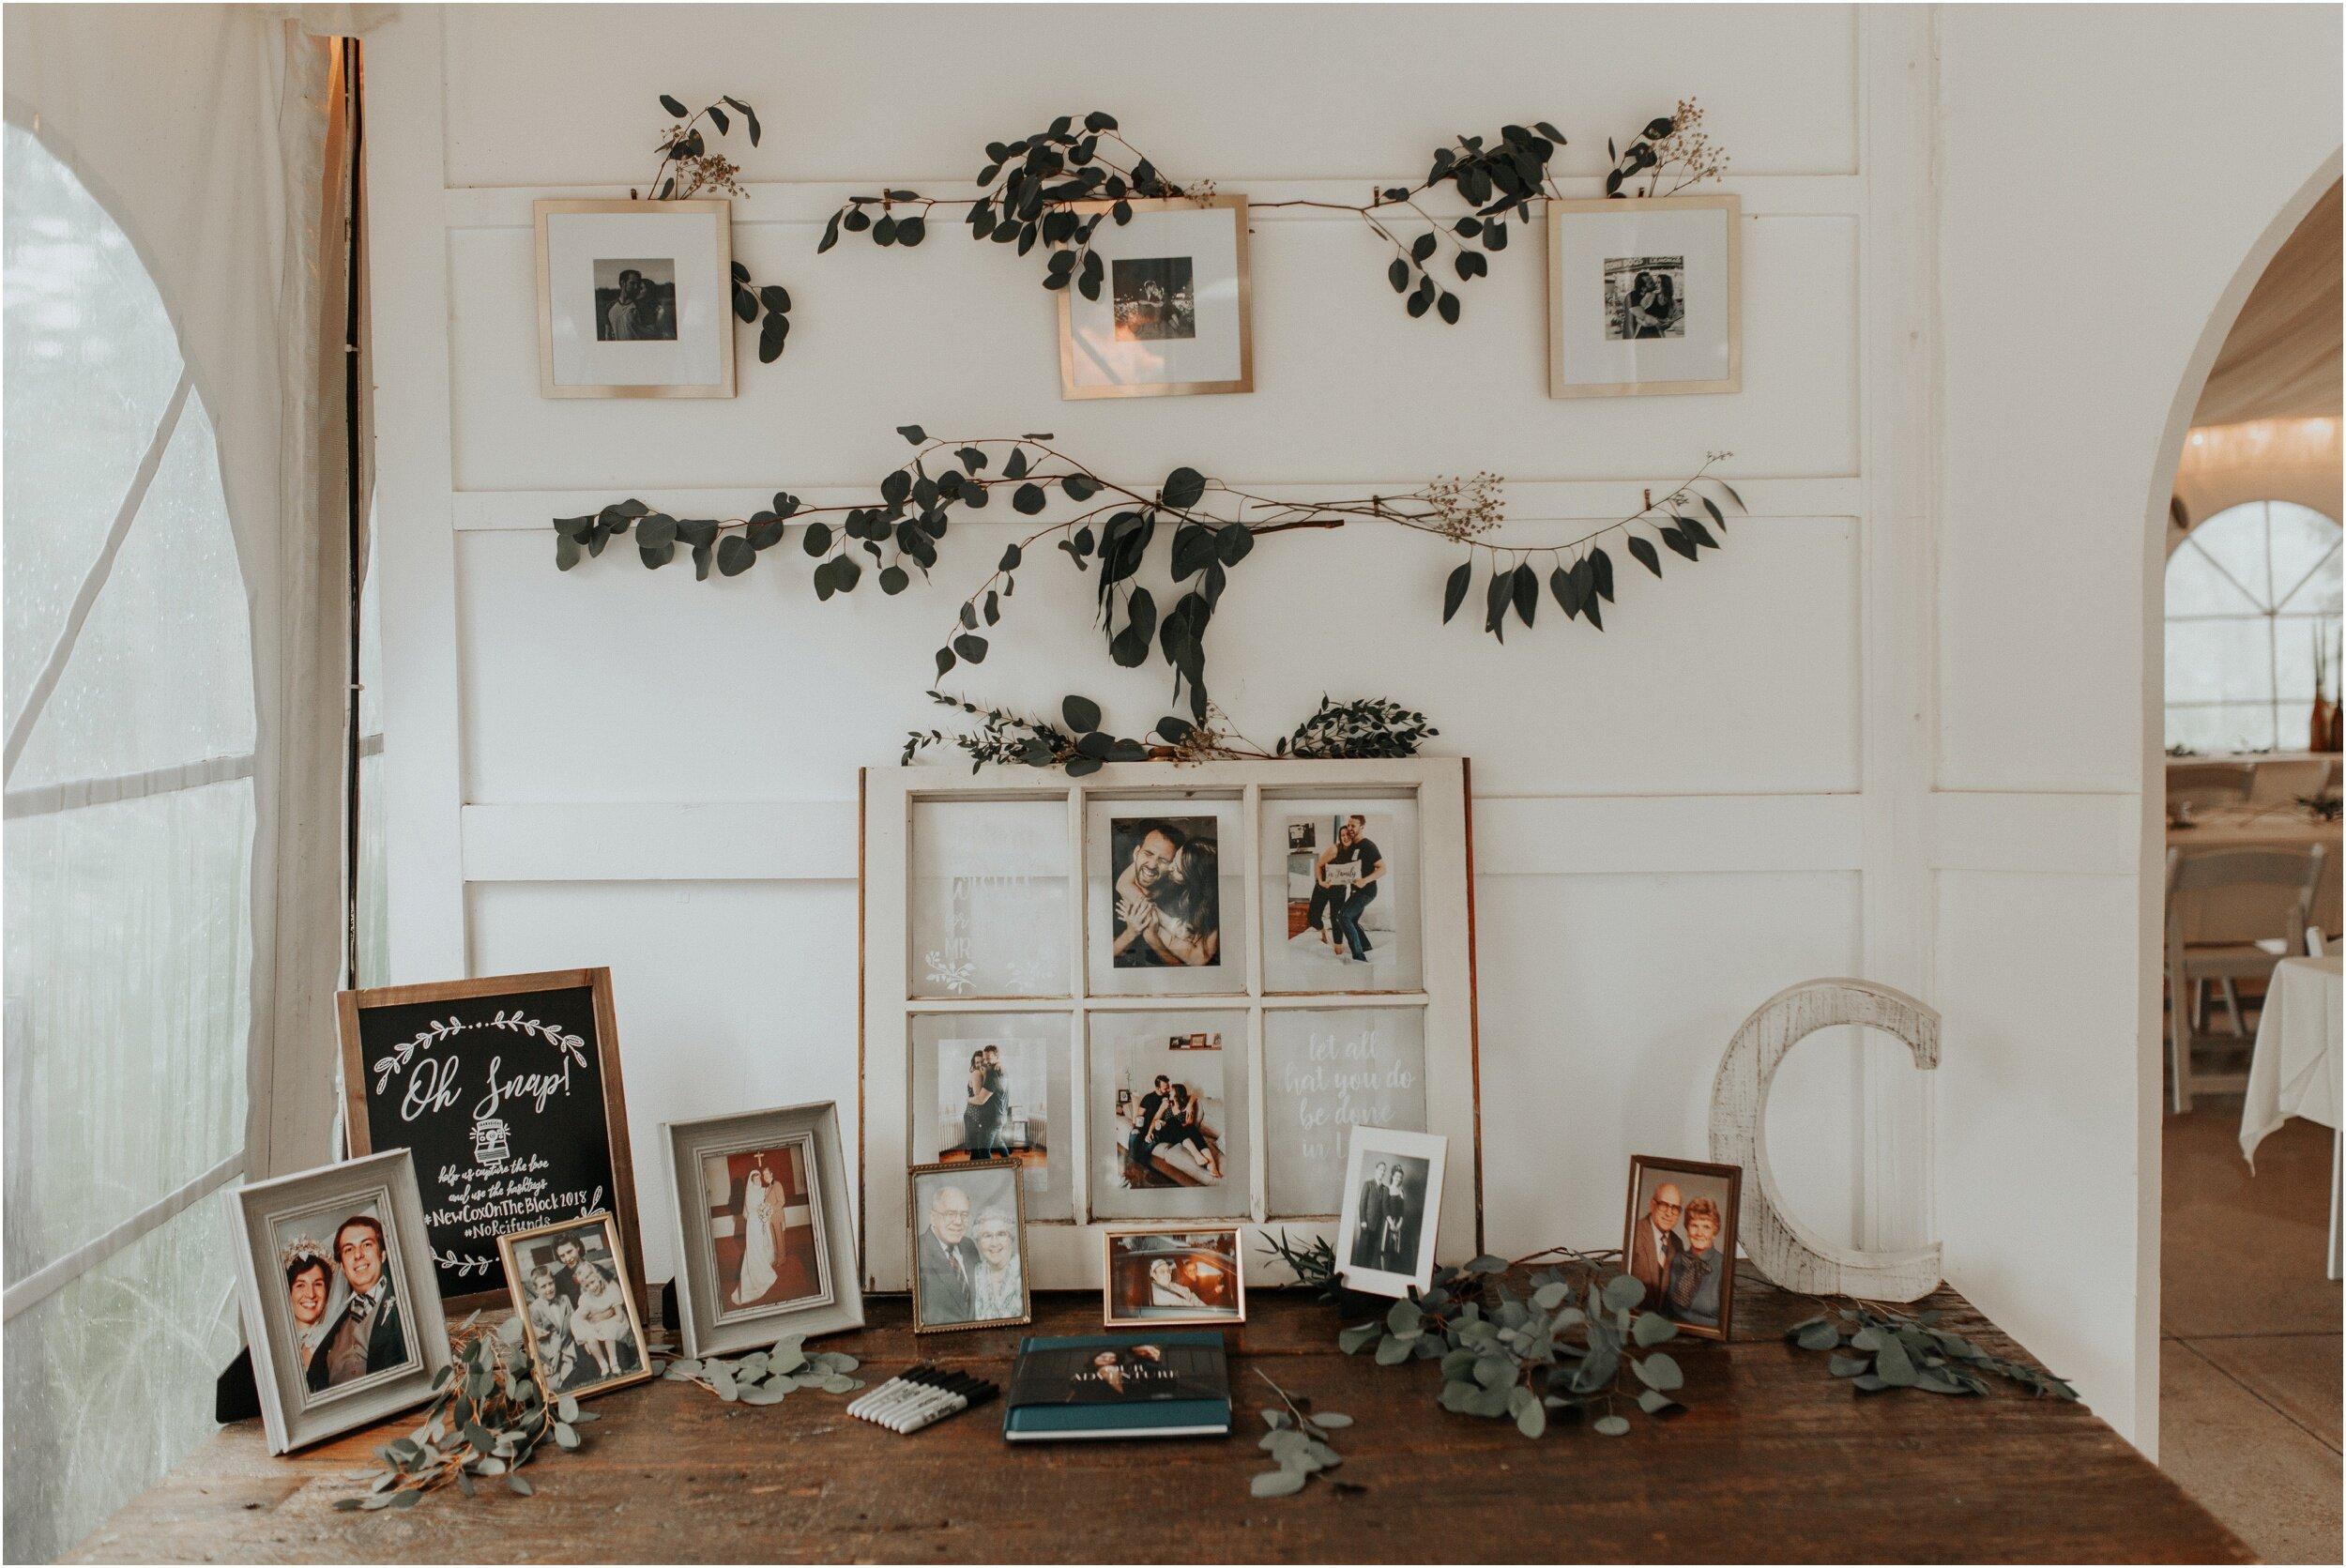 steph-and-jordan-cox-our-wedding-historic-shady-lane-compass-wedding-collective-hazel-lining-photography-destination-elopement-wedding-engagement-photography_0075.jpg